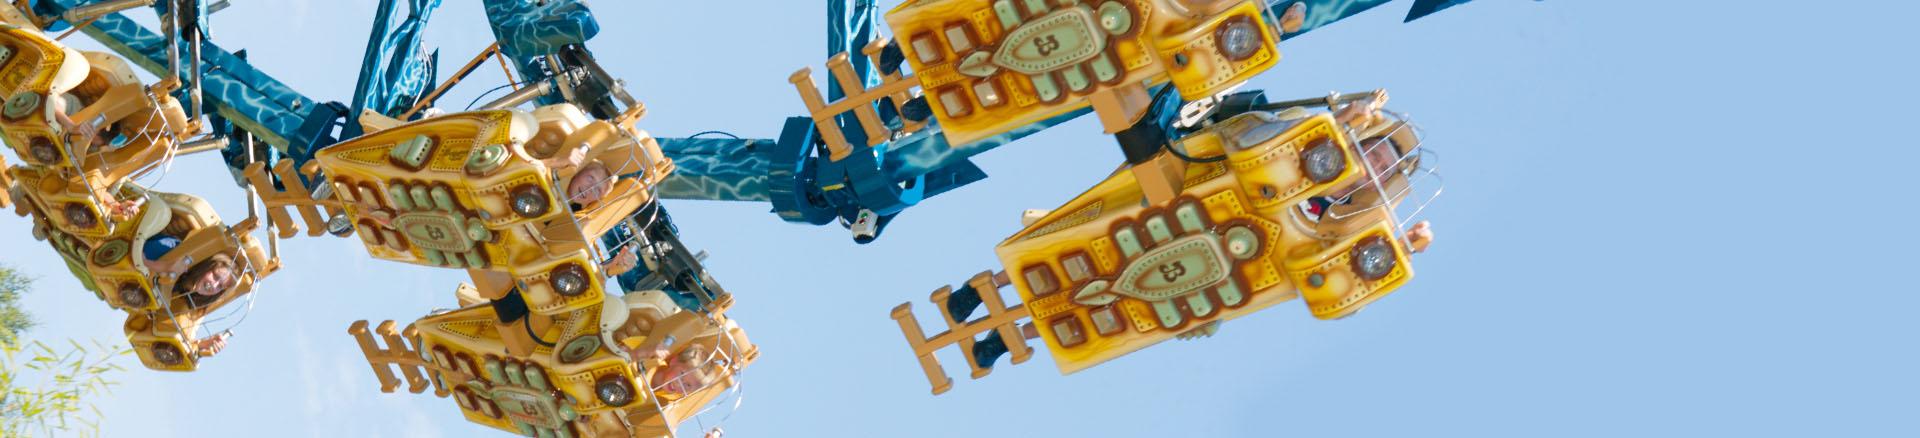 Slide_Flyaway